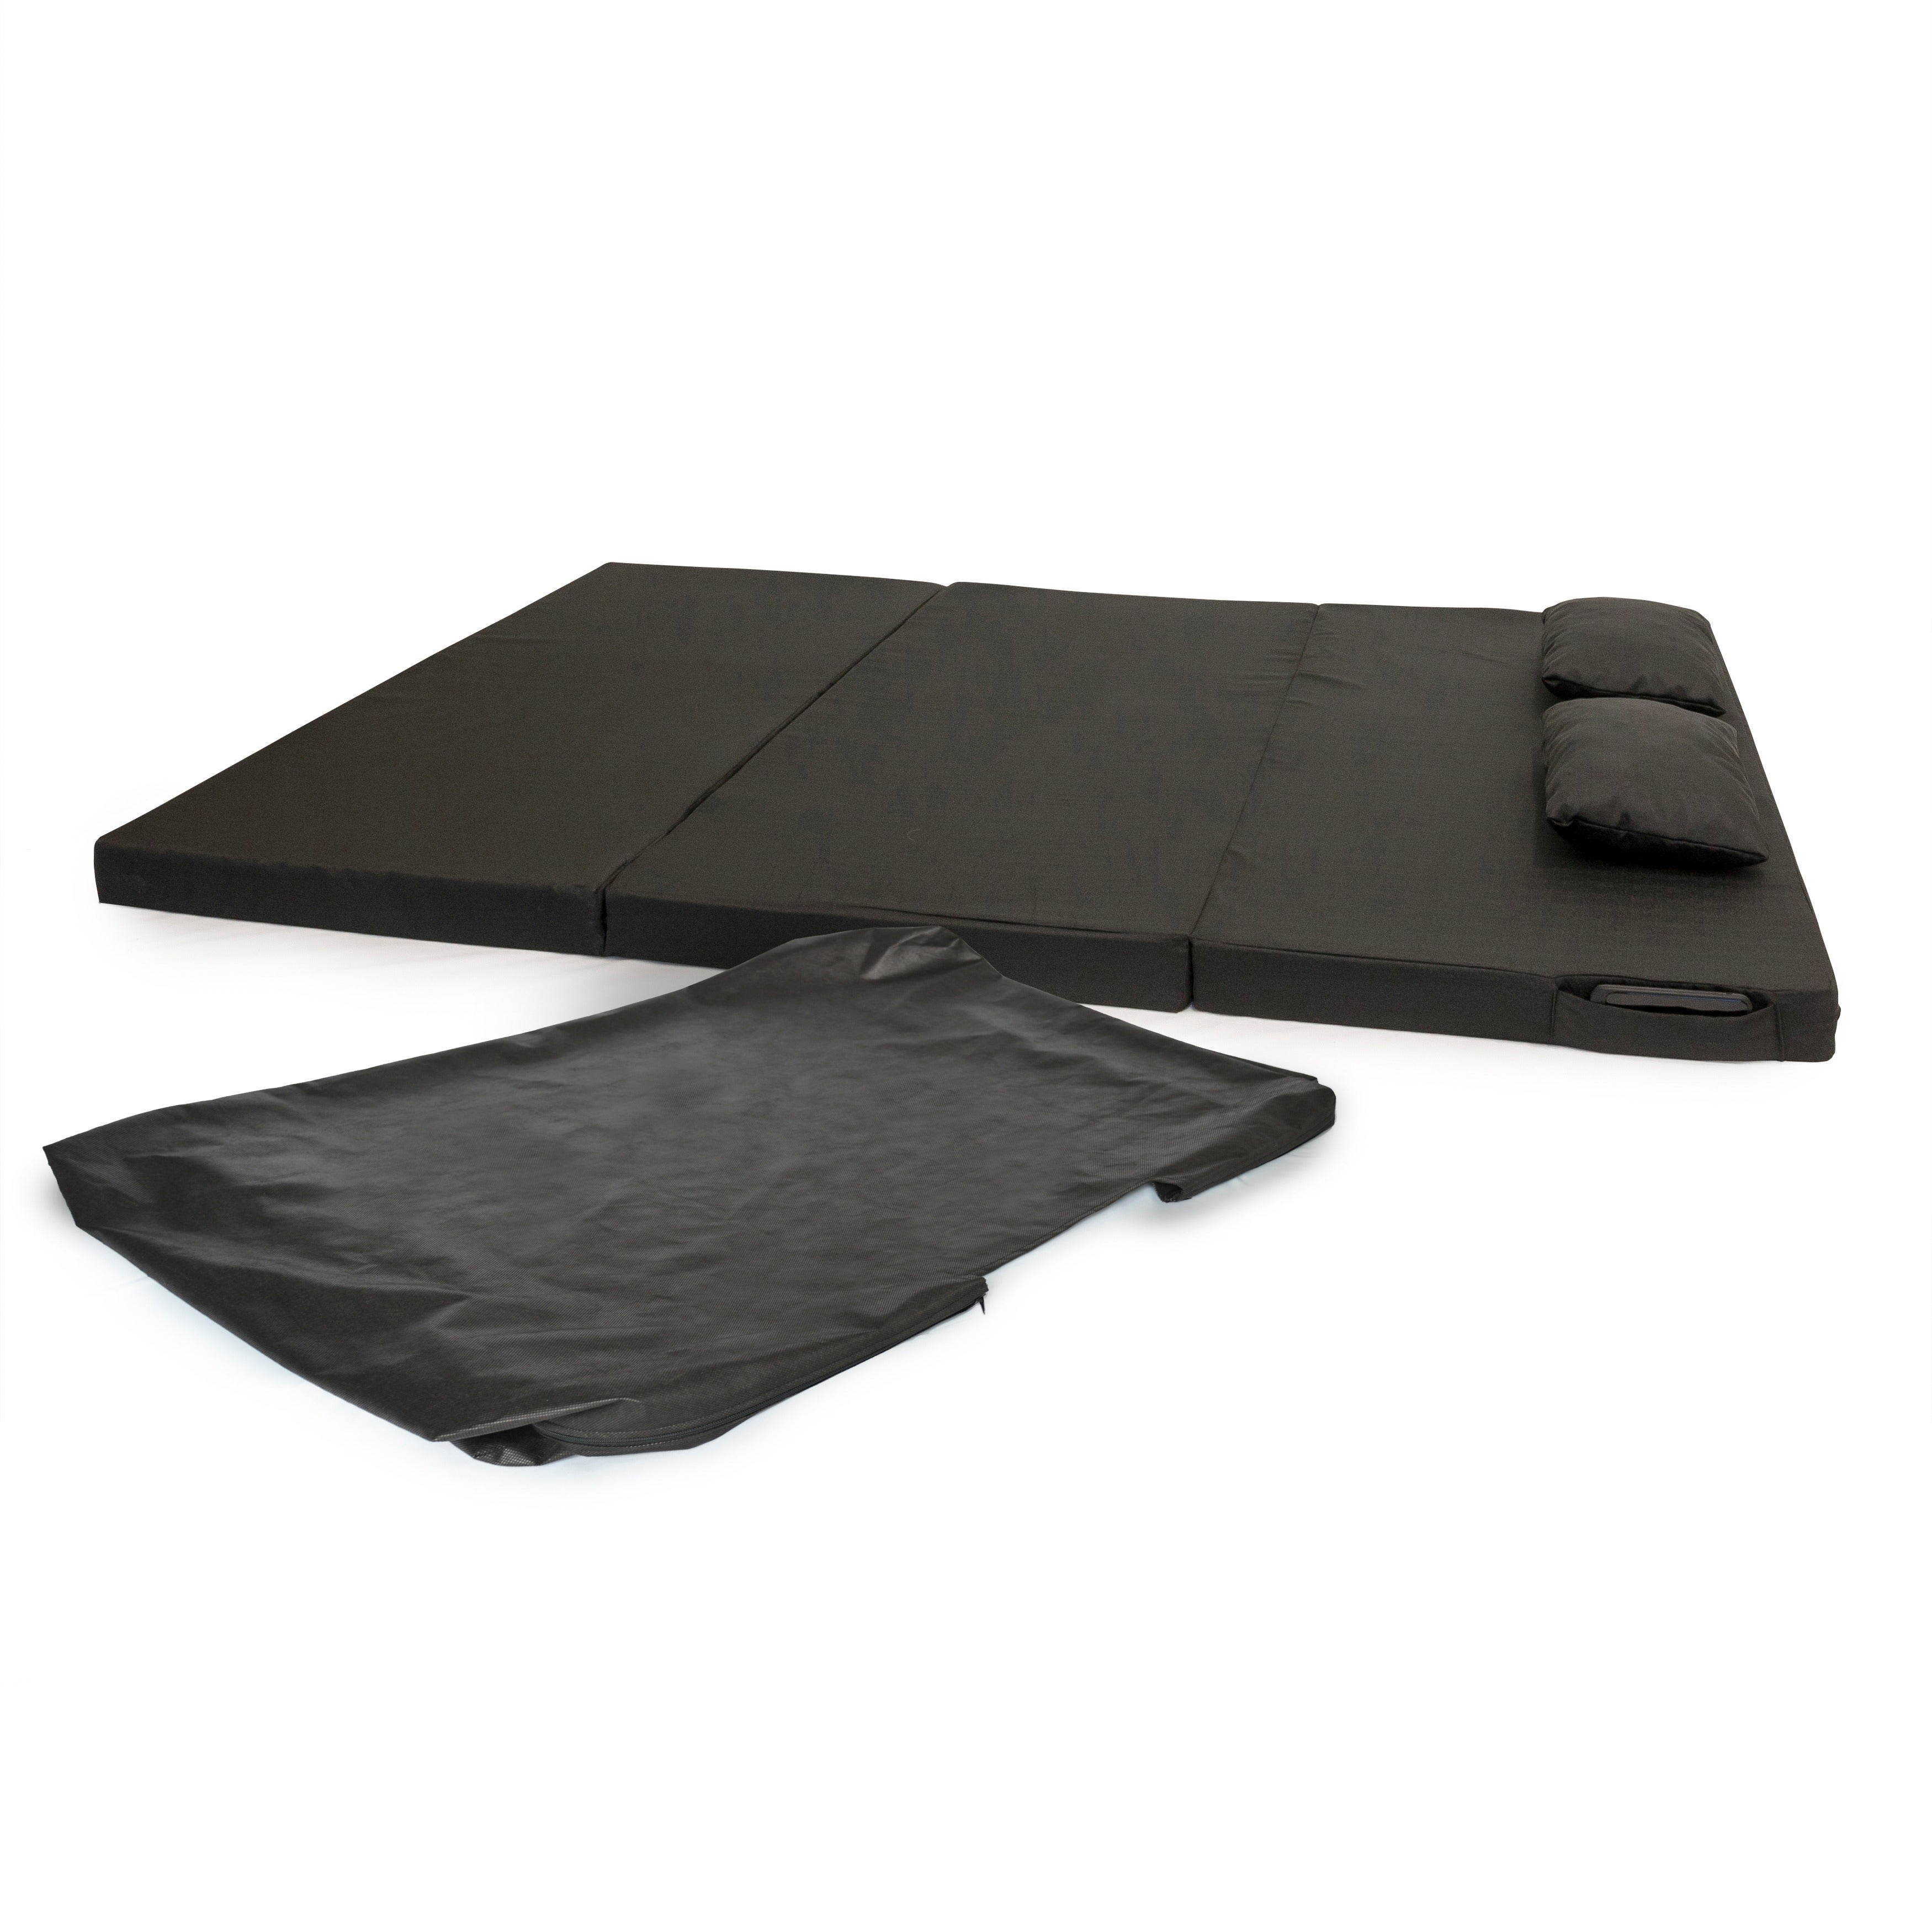 Integrity Bedding Tri-fold 75-inch Portable Foam Mat Pad ...